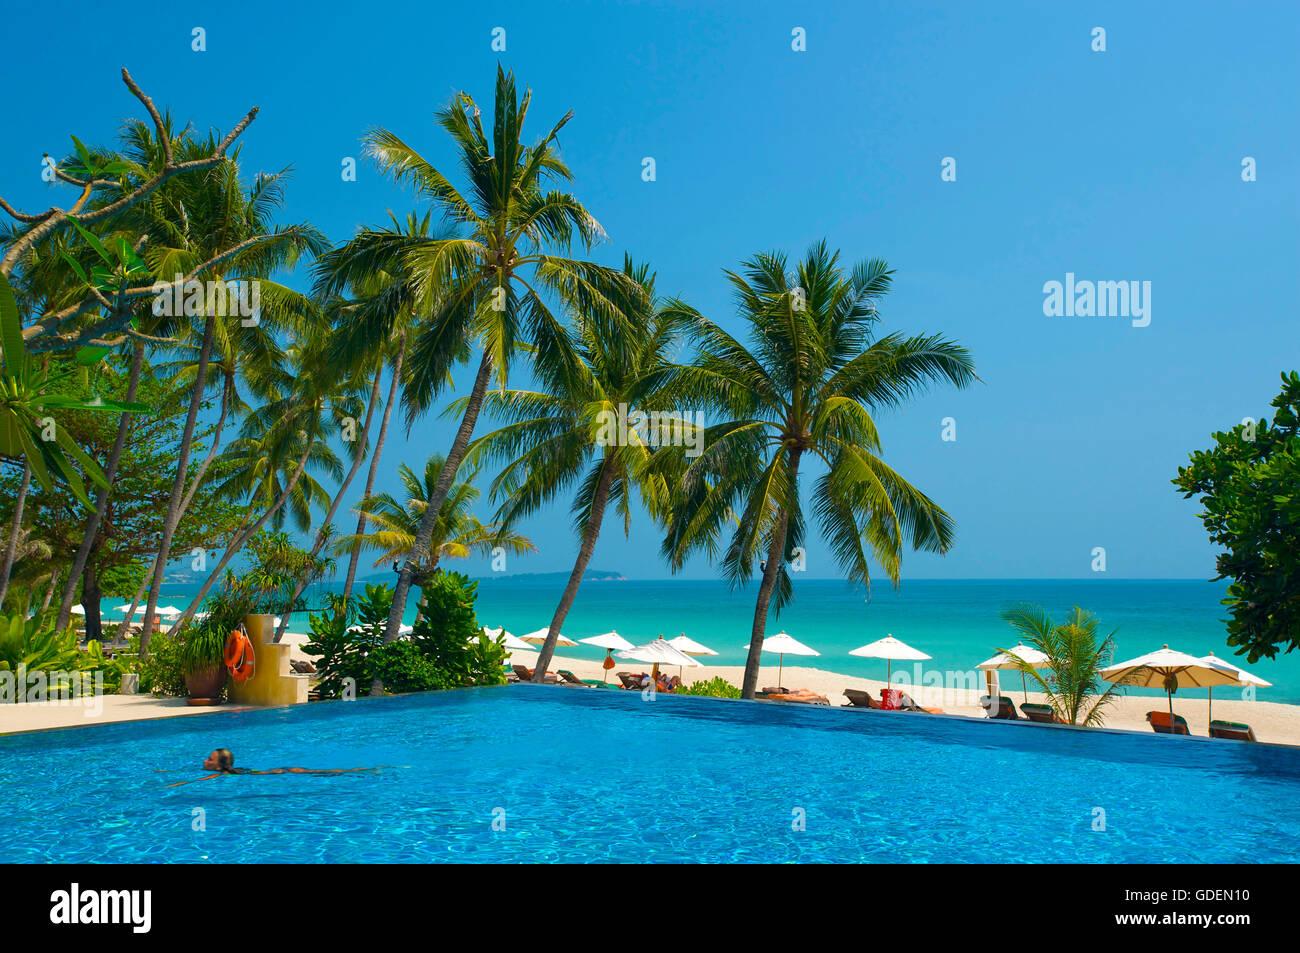 Hotel at Chaweng Beach, Ko Samui Island, Thailand - Stock Image